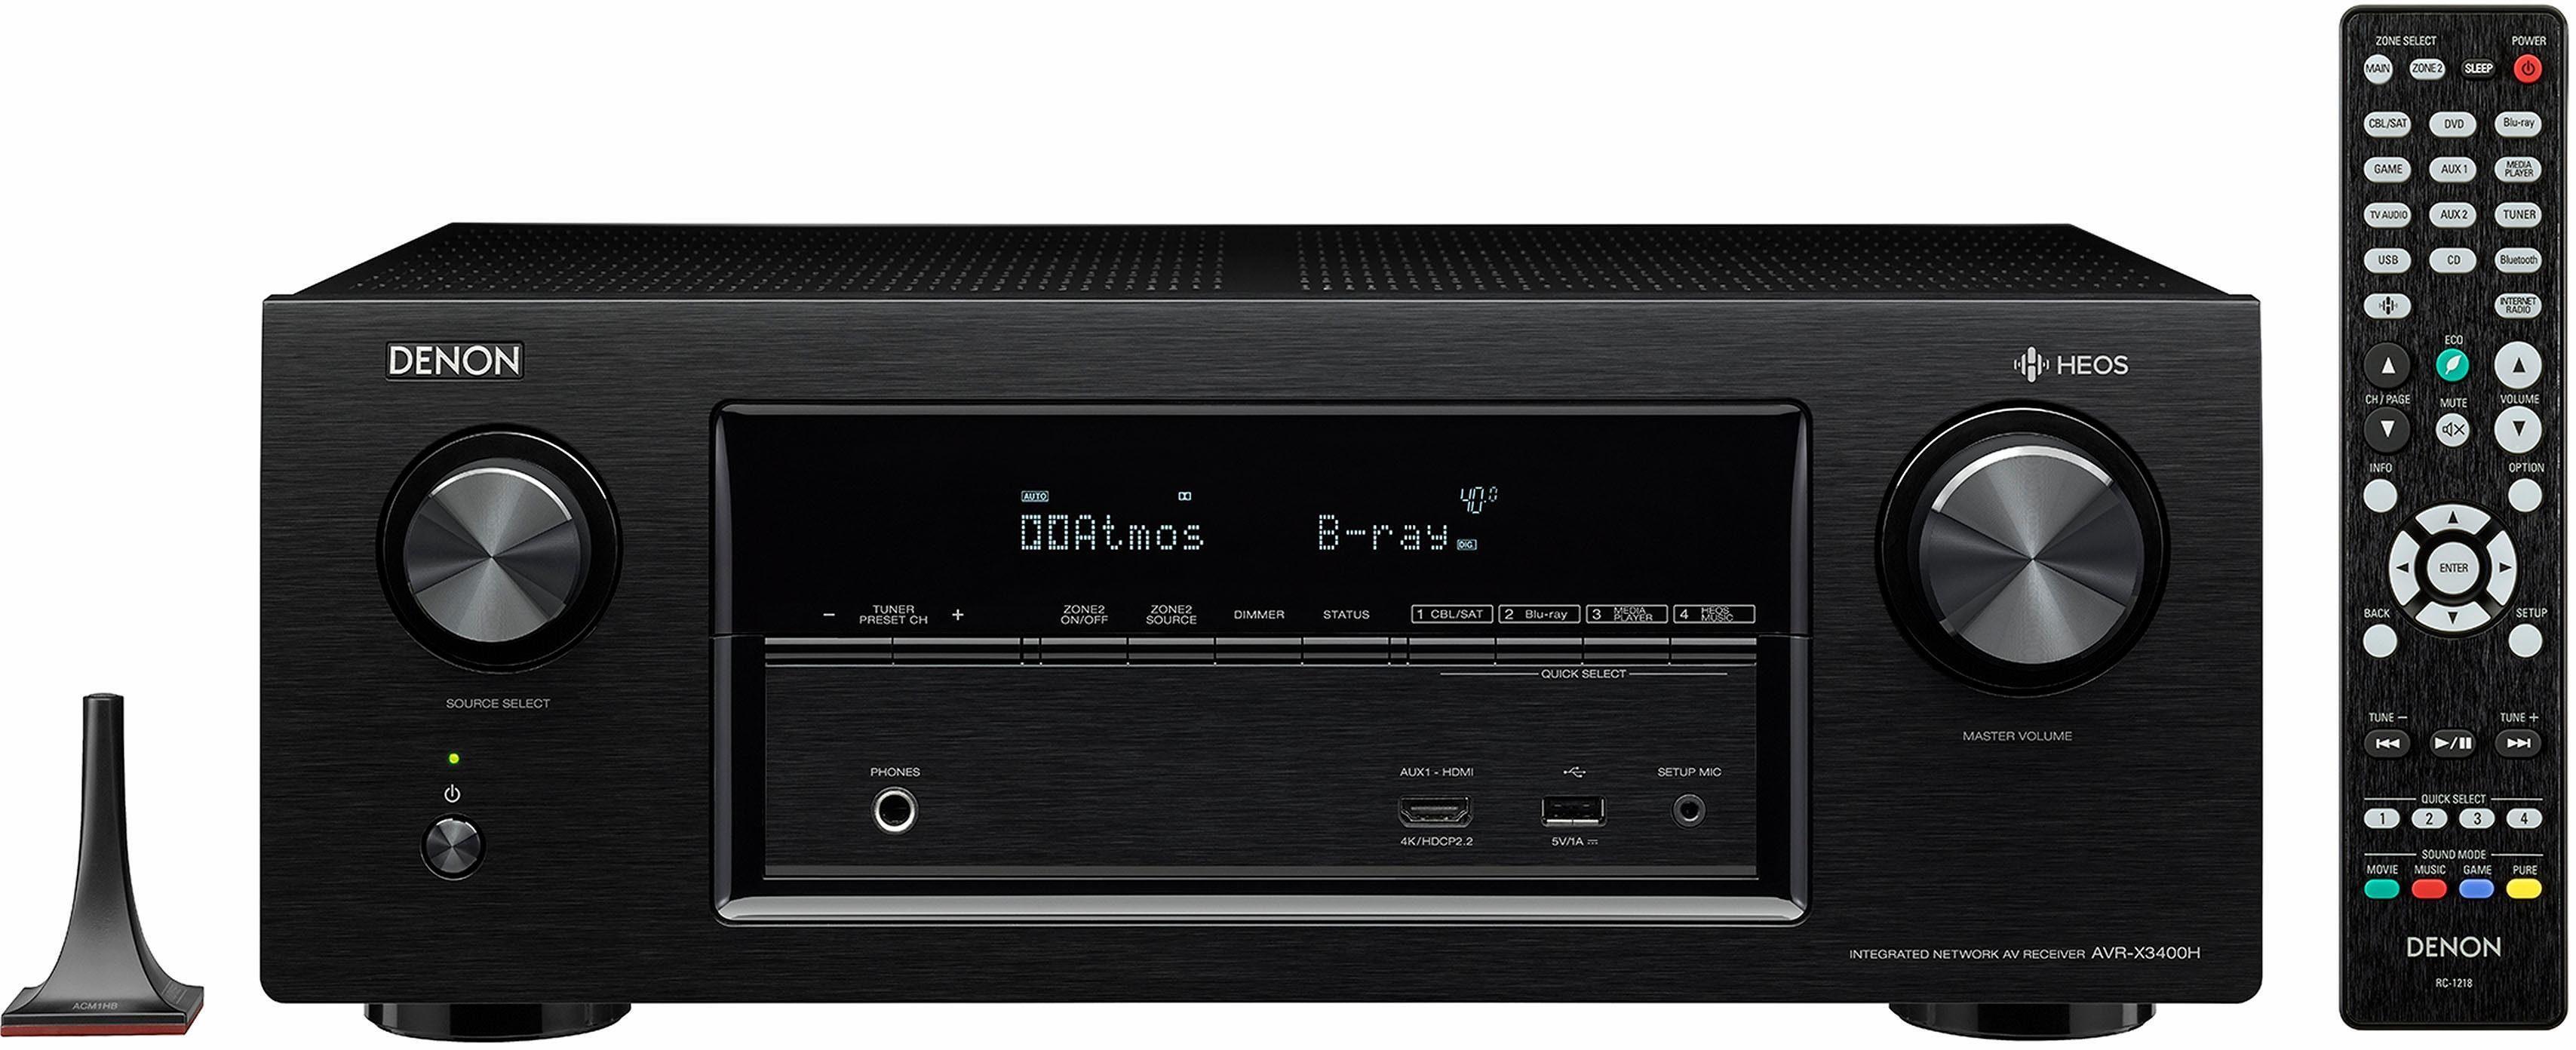 Denon AVRX3400H 7.2-Kanal AV-Receiver (Hi-Res, Spotify Connect, Deezer, Airplay, WLAN, Bluetooth)